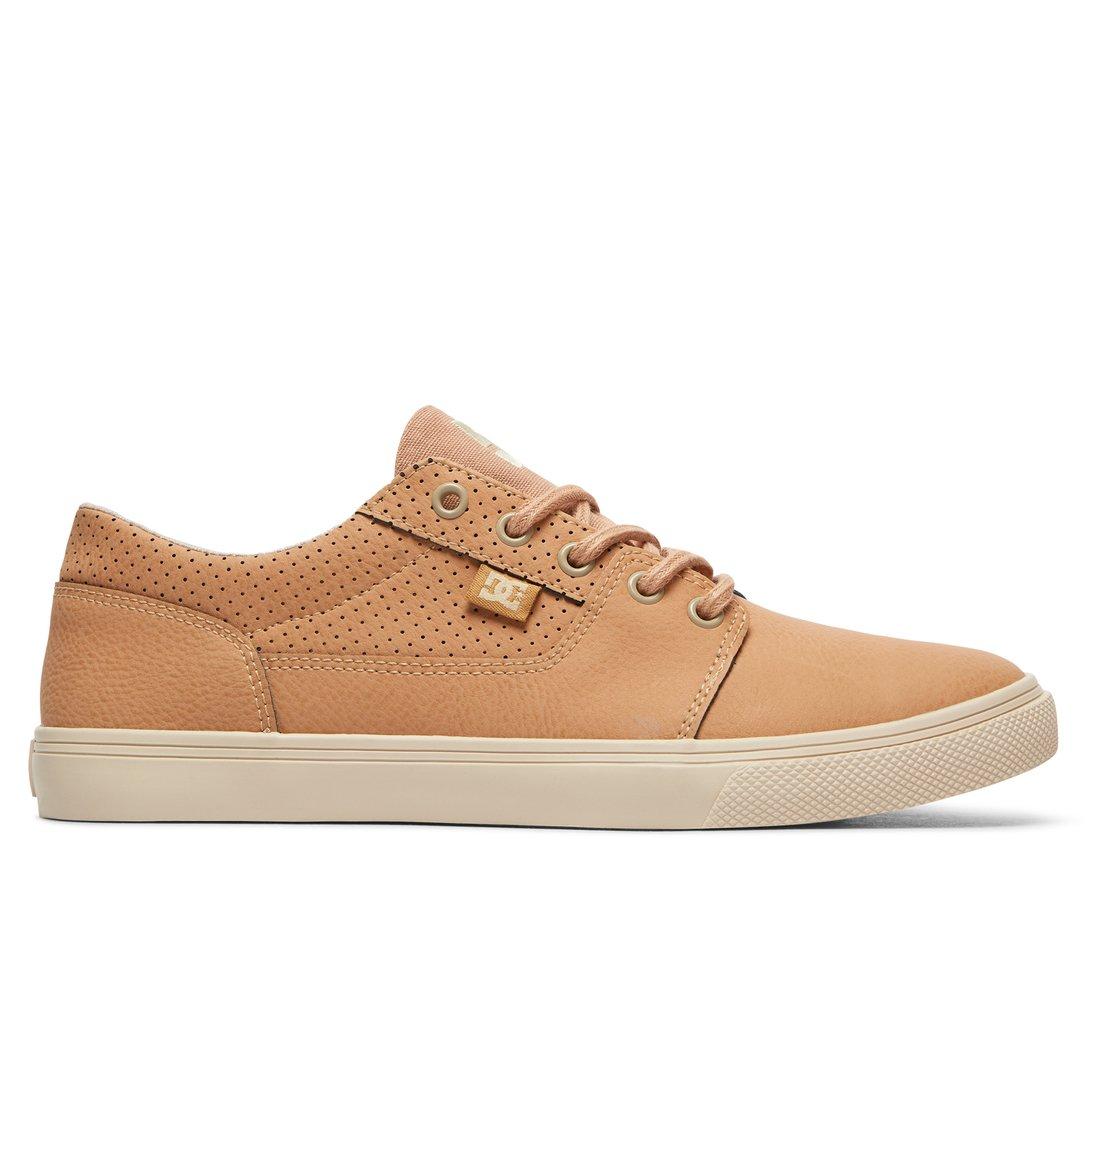 DC Shoes Schuhe »Tonik W LE«, braun, Brown/chocolate